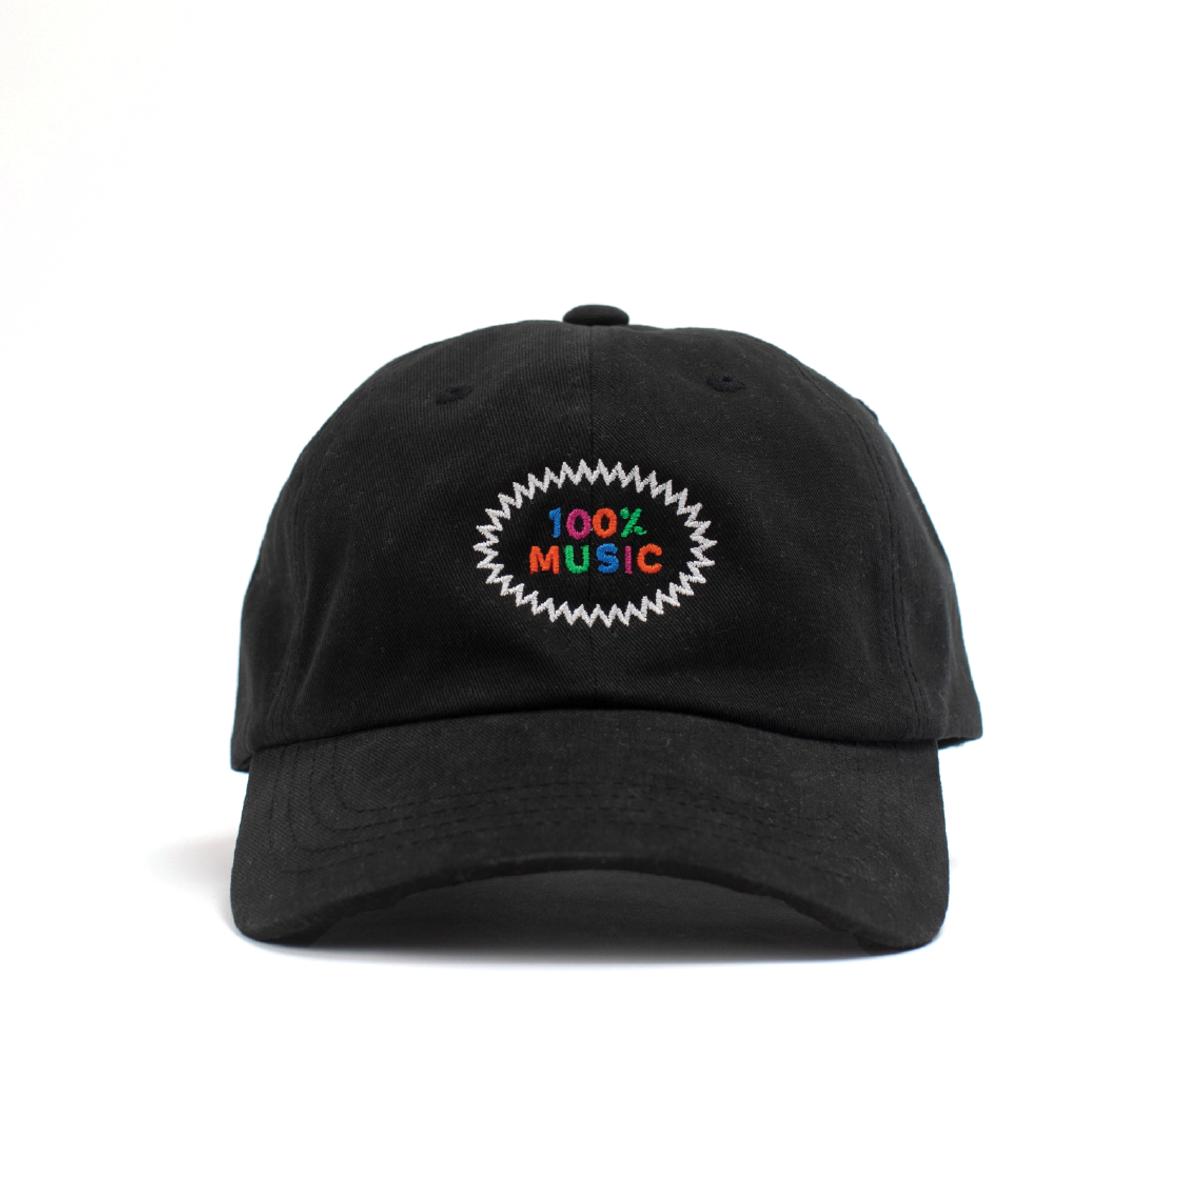 100% Music Hat - Hembree